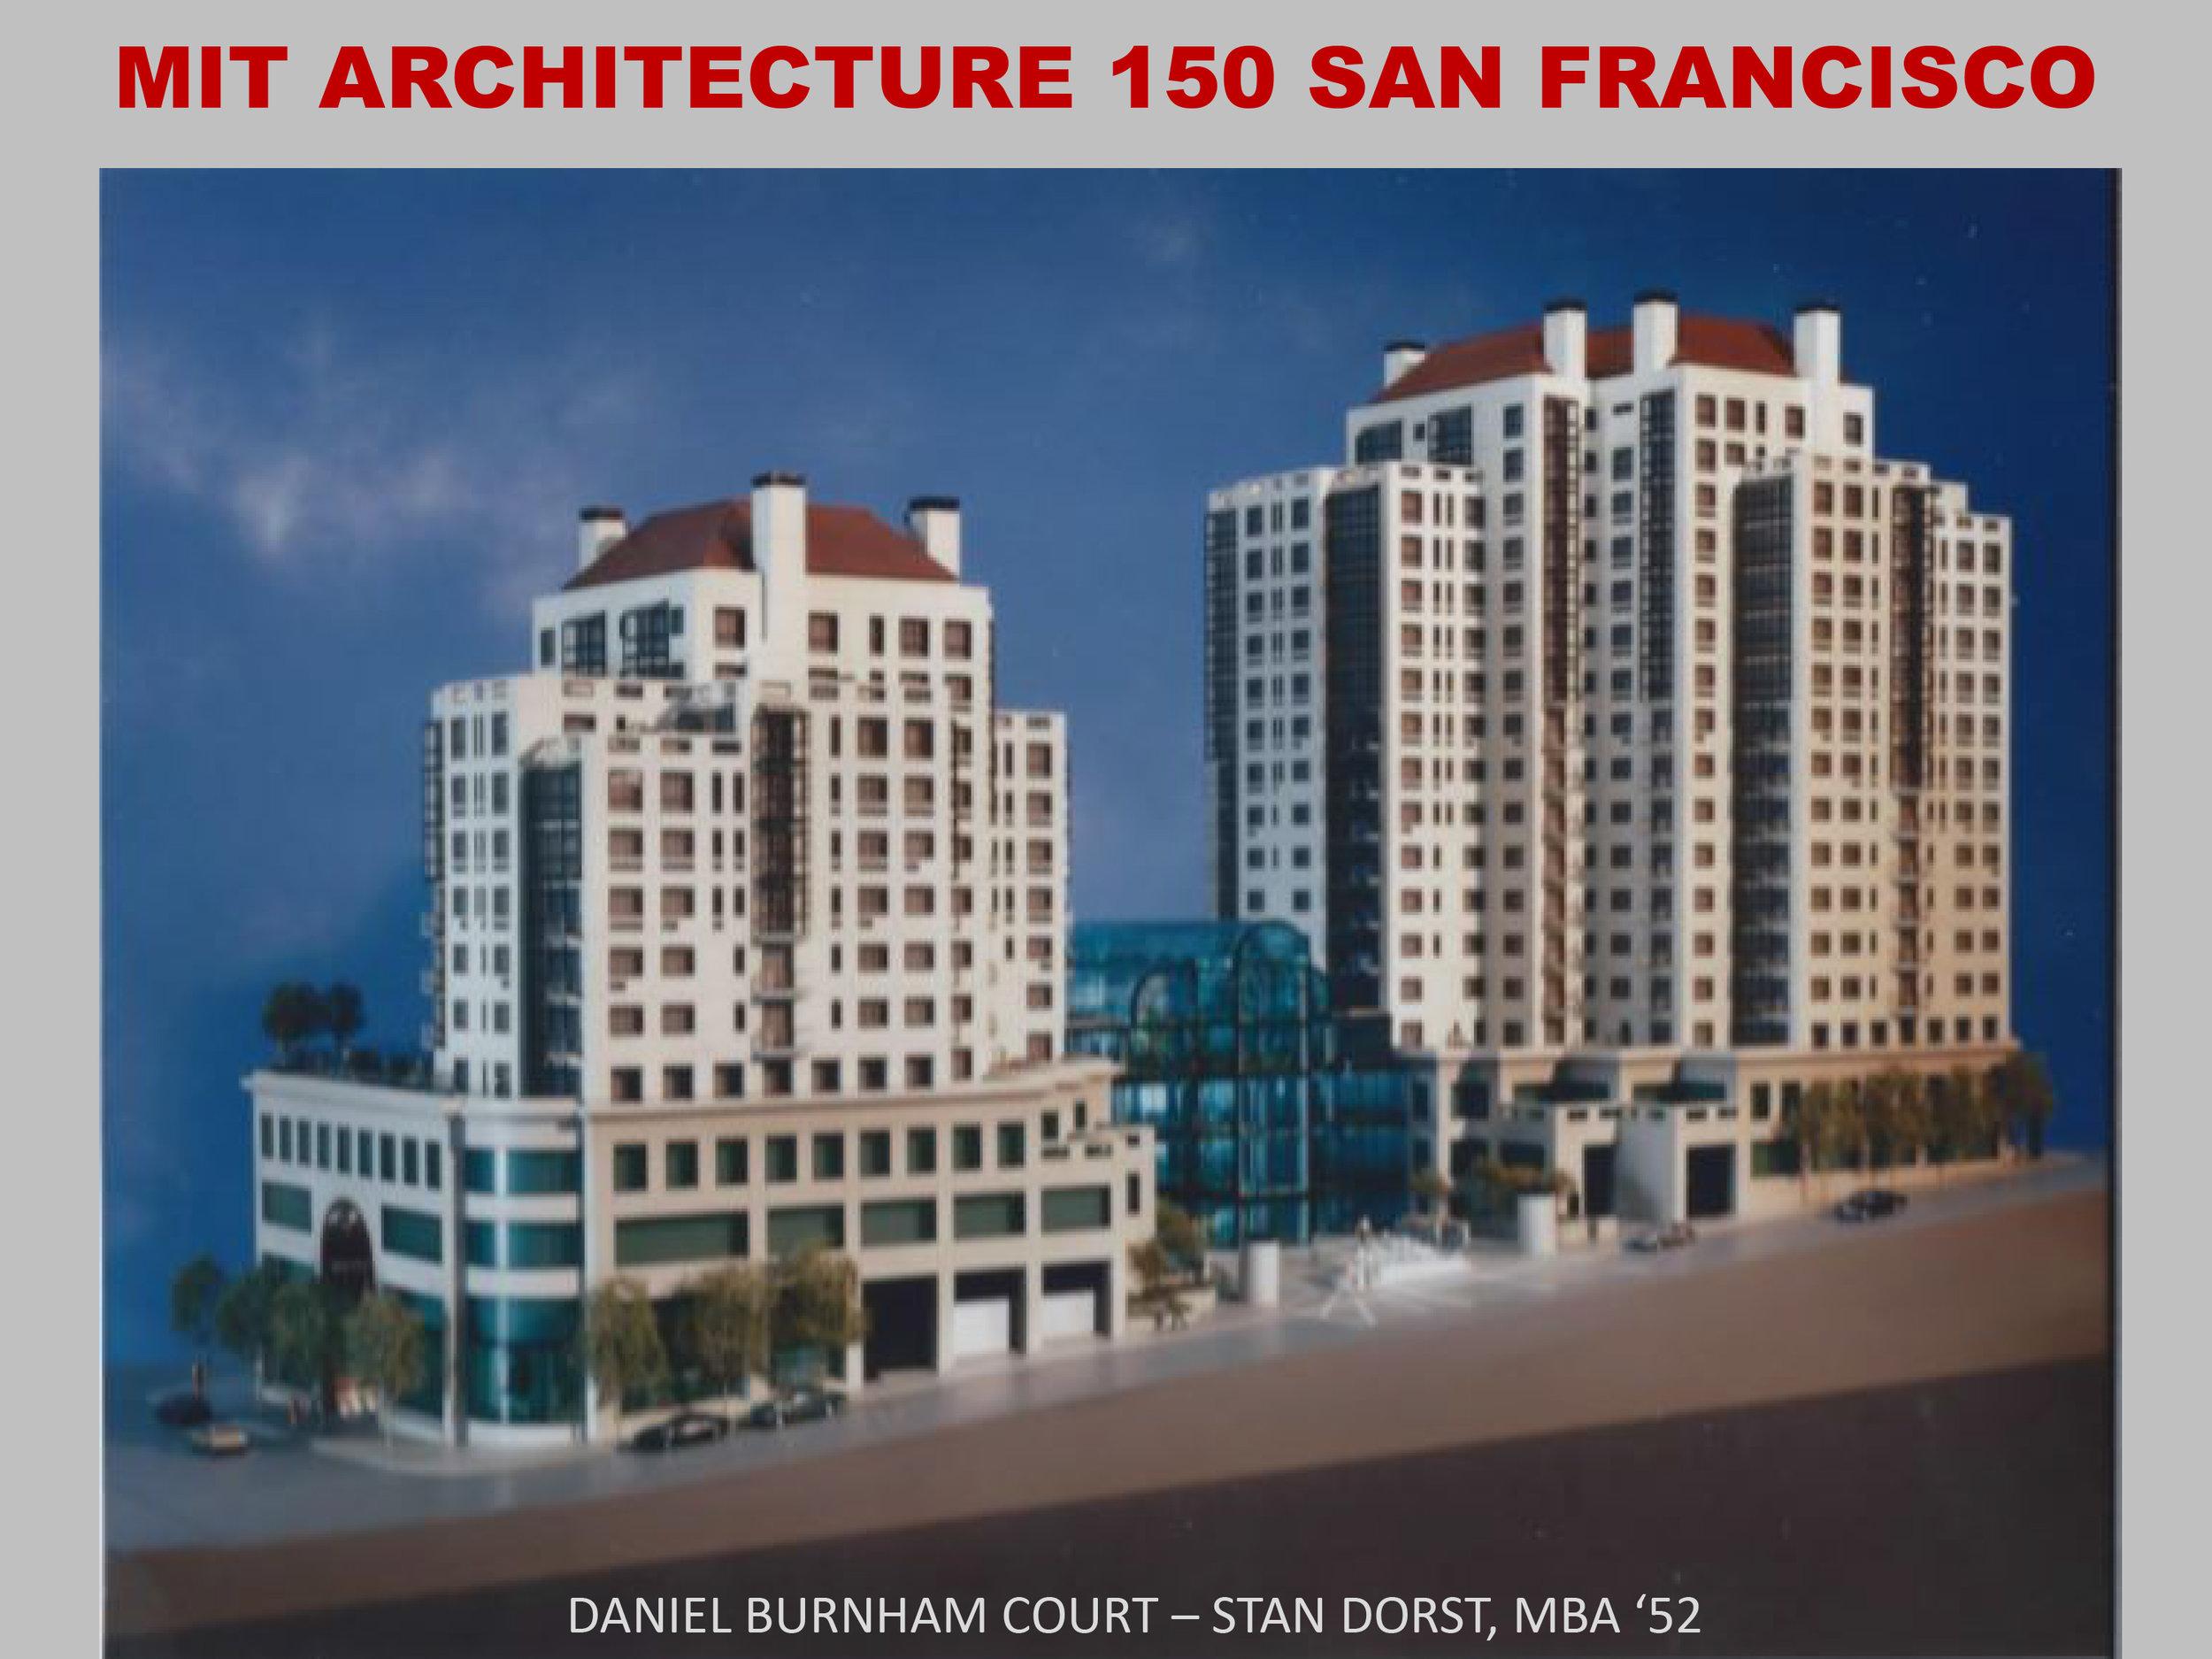 MIT ARCHITECTURE 150 SAN FRANCISCO SLIDESHOW-68 copy.jpg